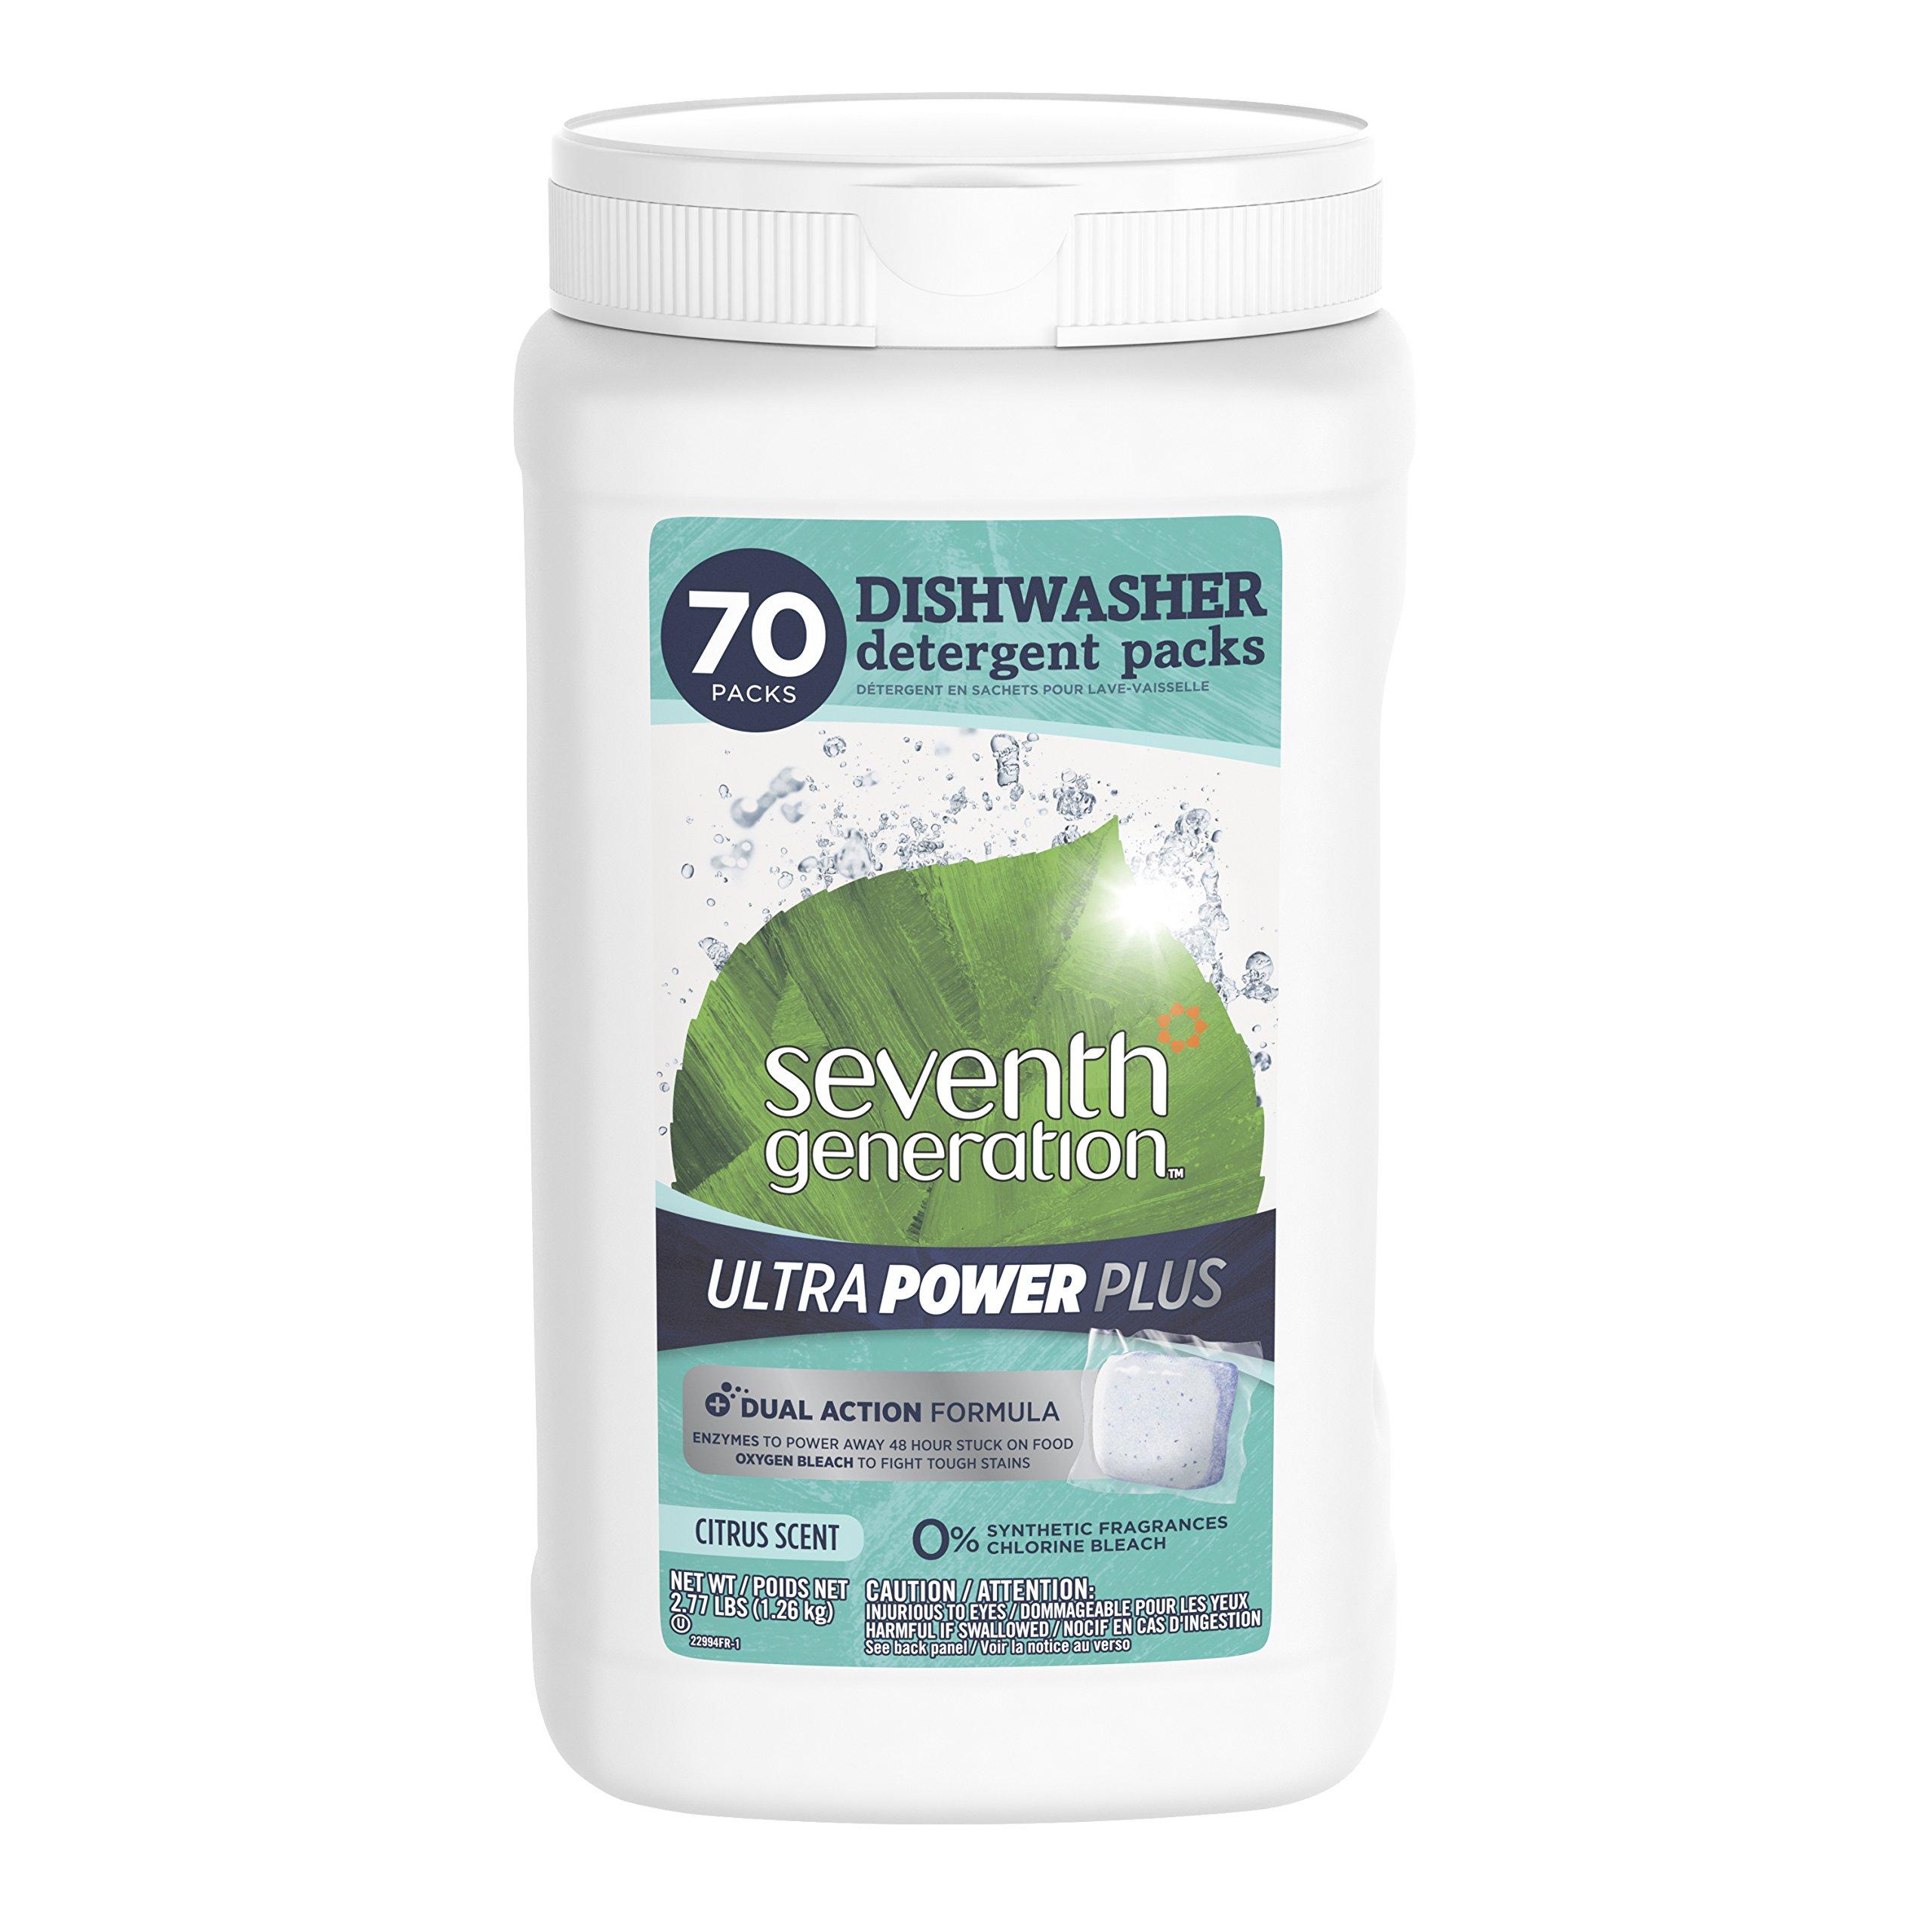 Seventh Generation Ultra Power Plus Dishwasher Detergent Packs, Fresh Citrus Scent, 70 count